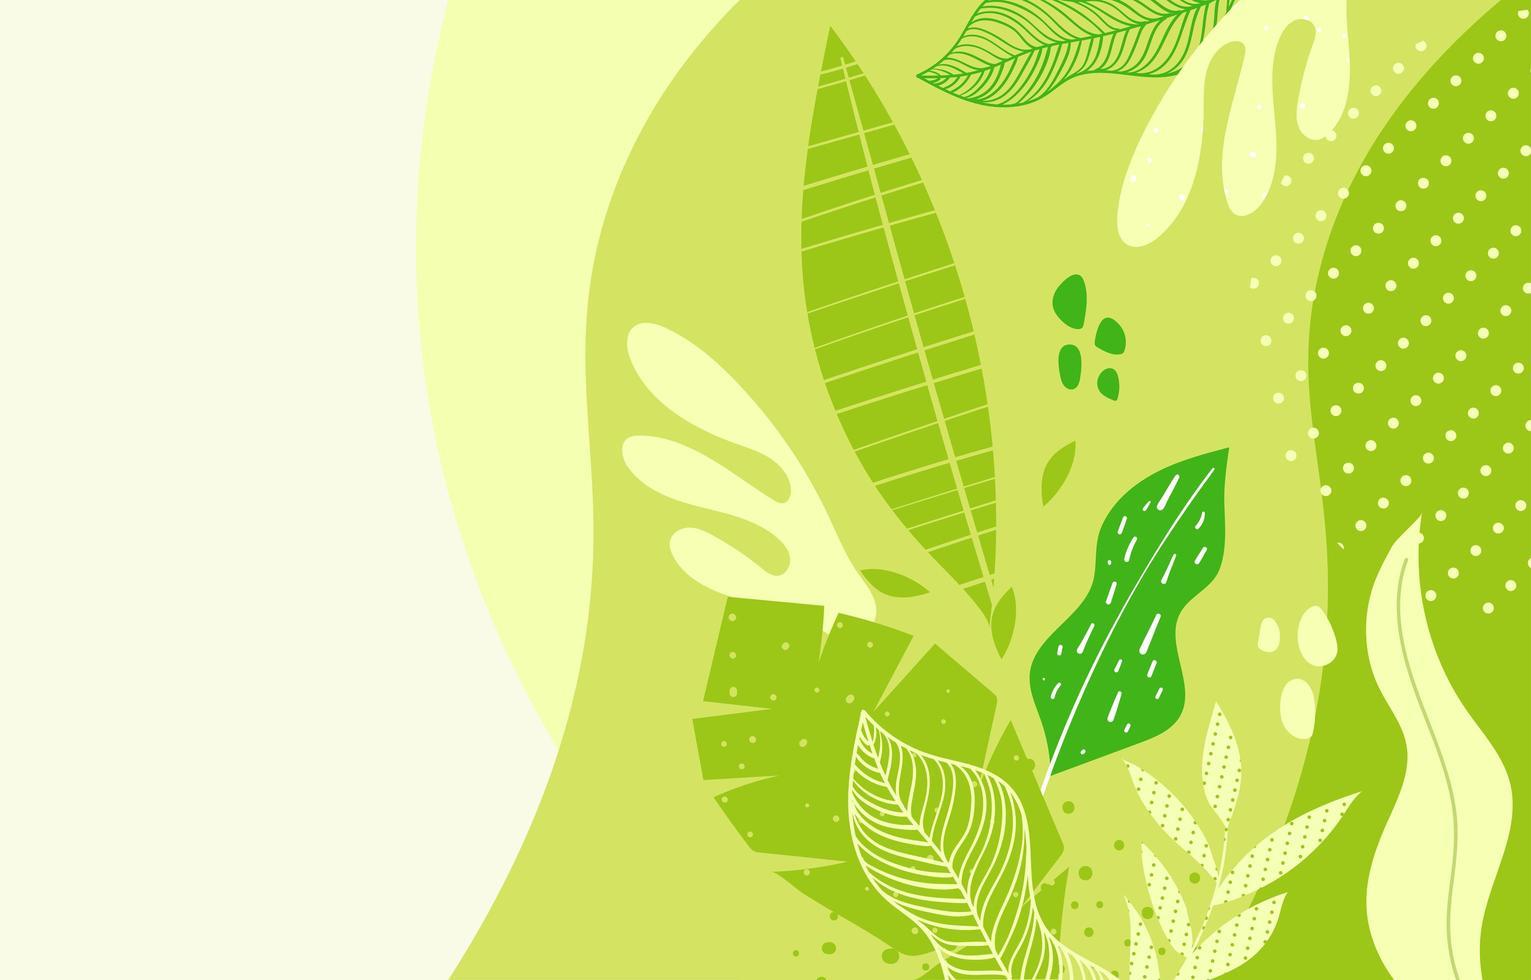 Naturblumengrüner Hintergrund vektor